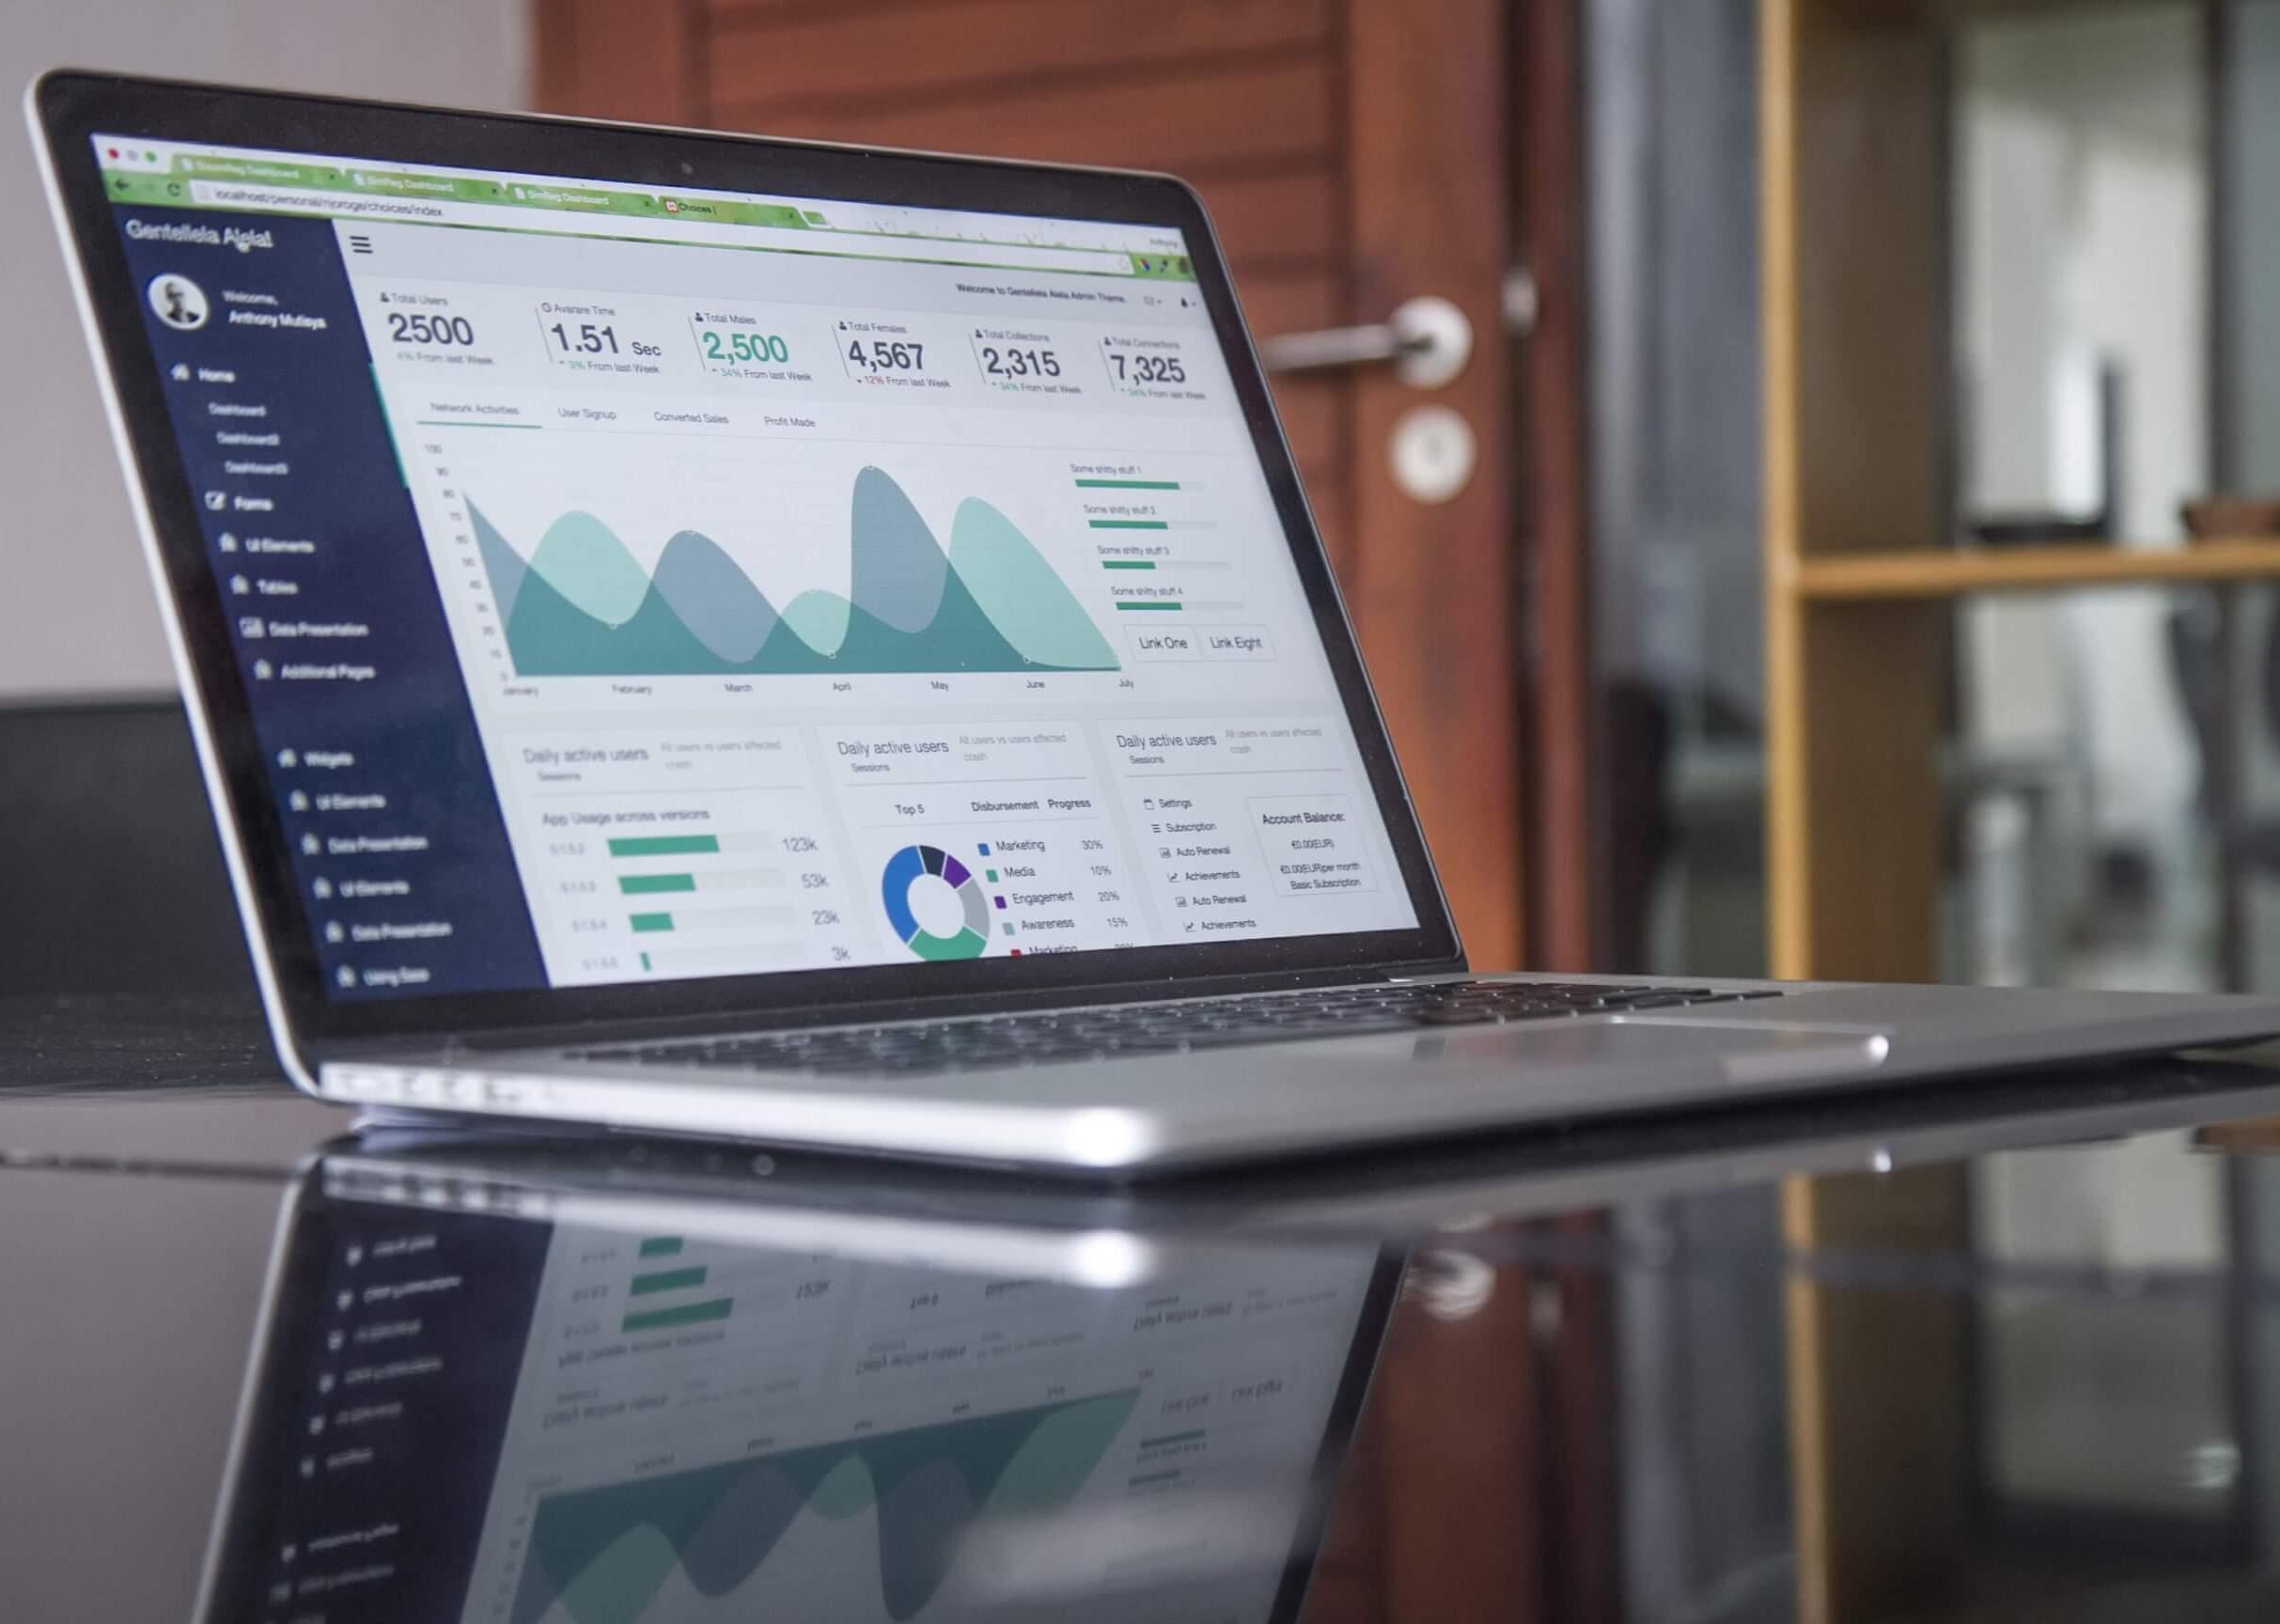 5 Best WordPress Website Speed Test Tools 2020